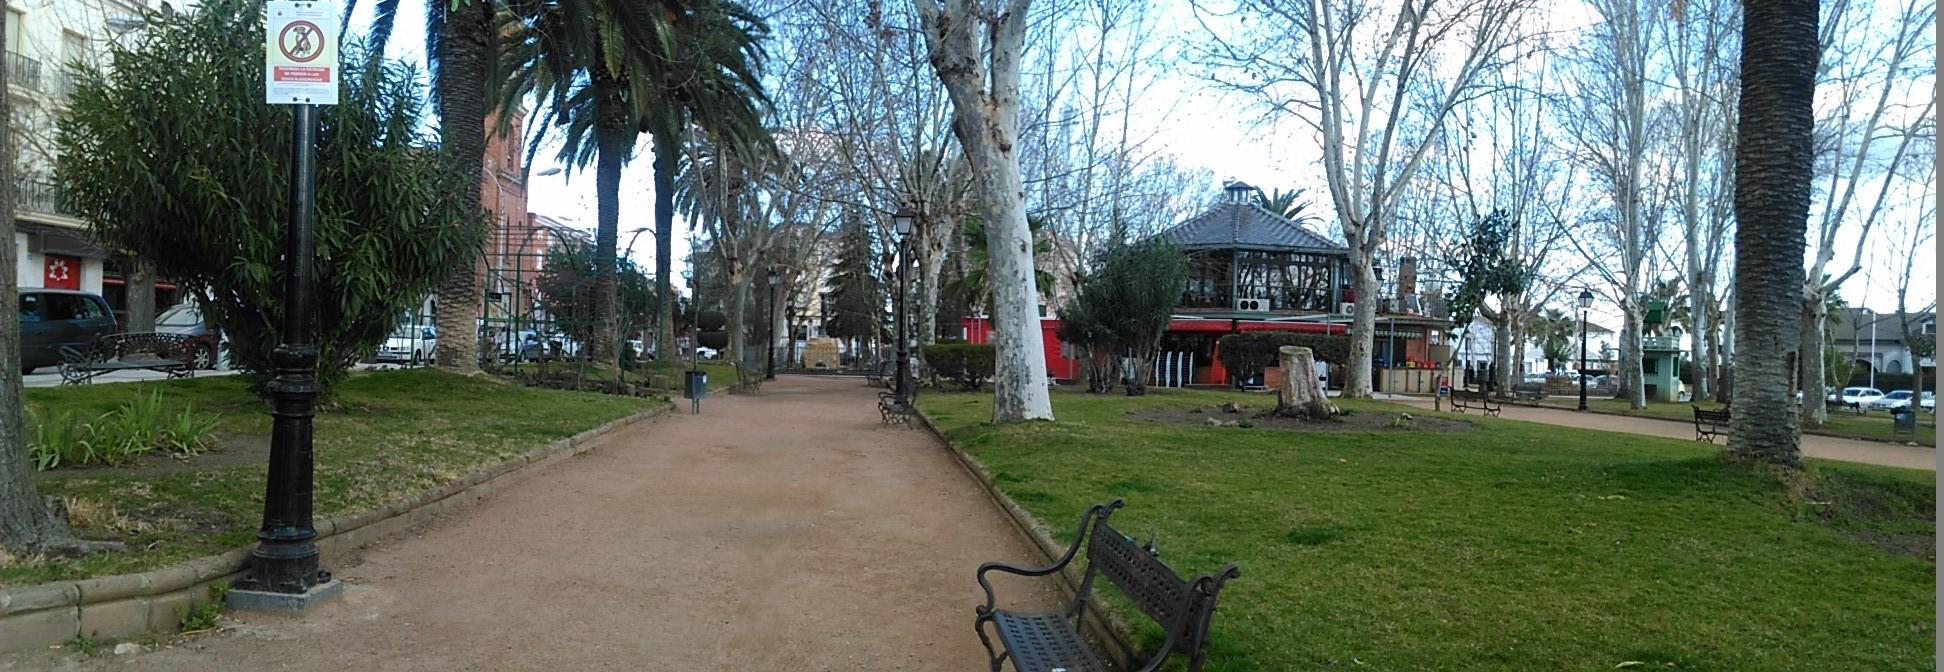 plaza santa barbara 2